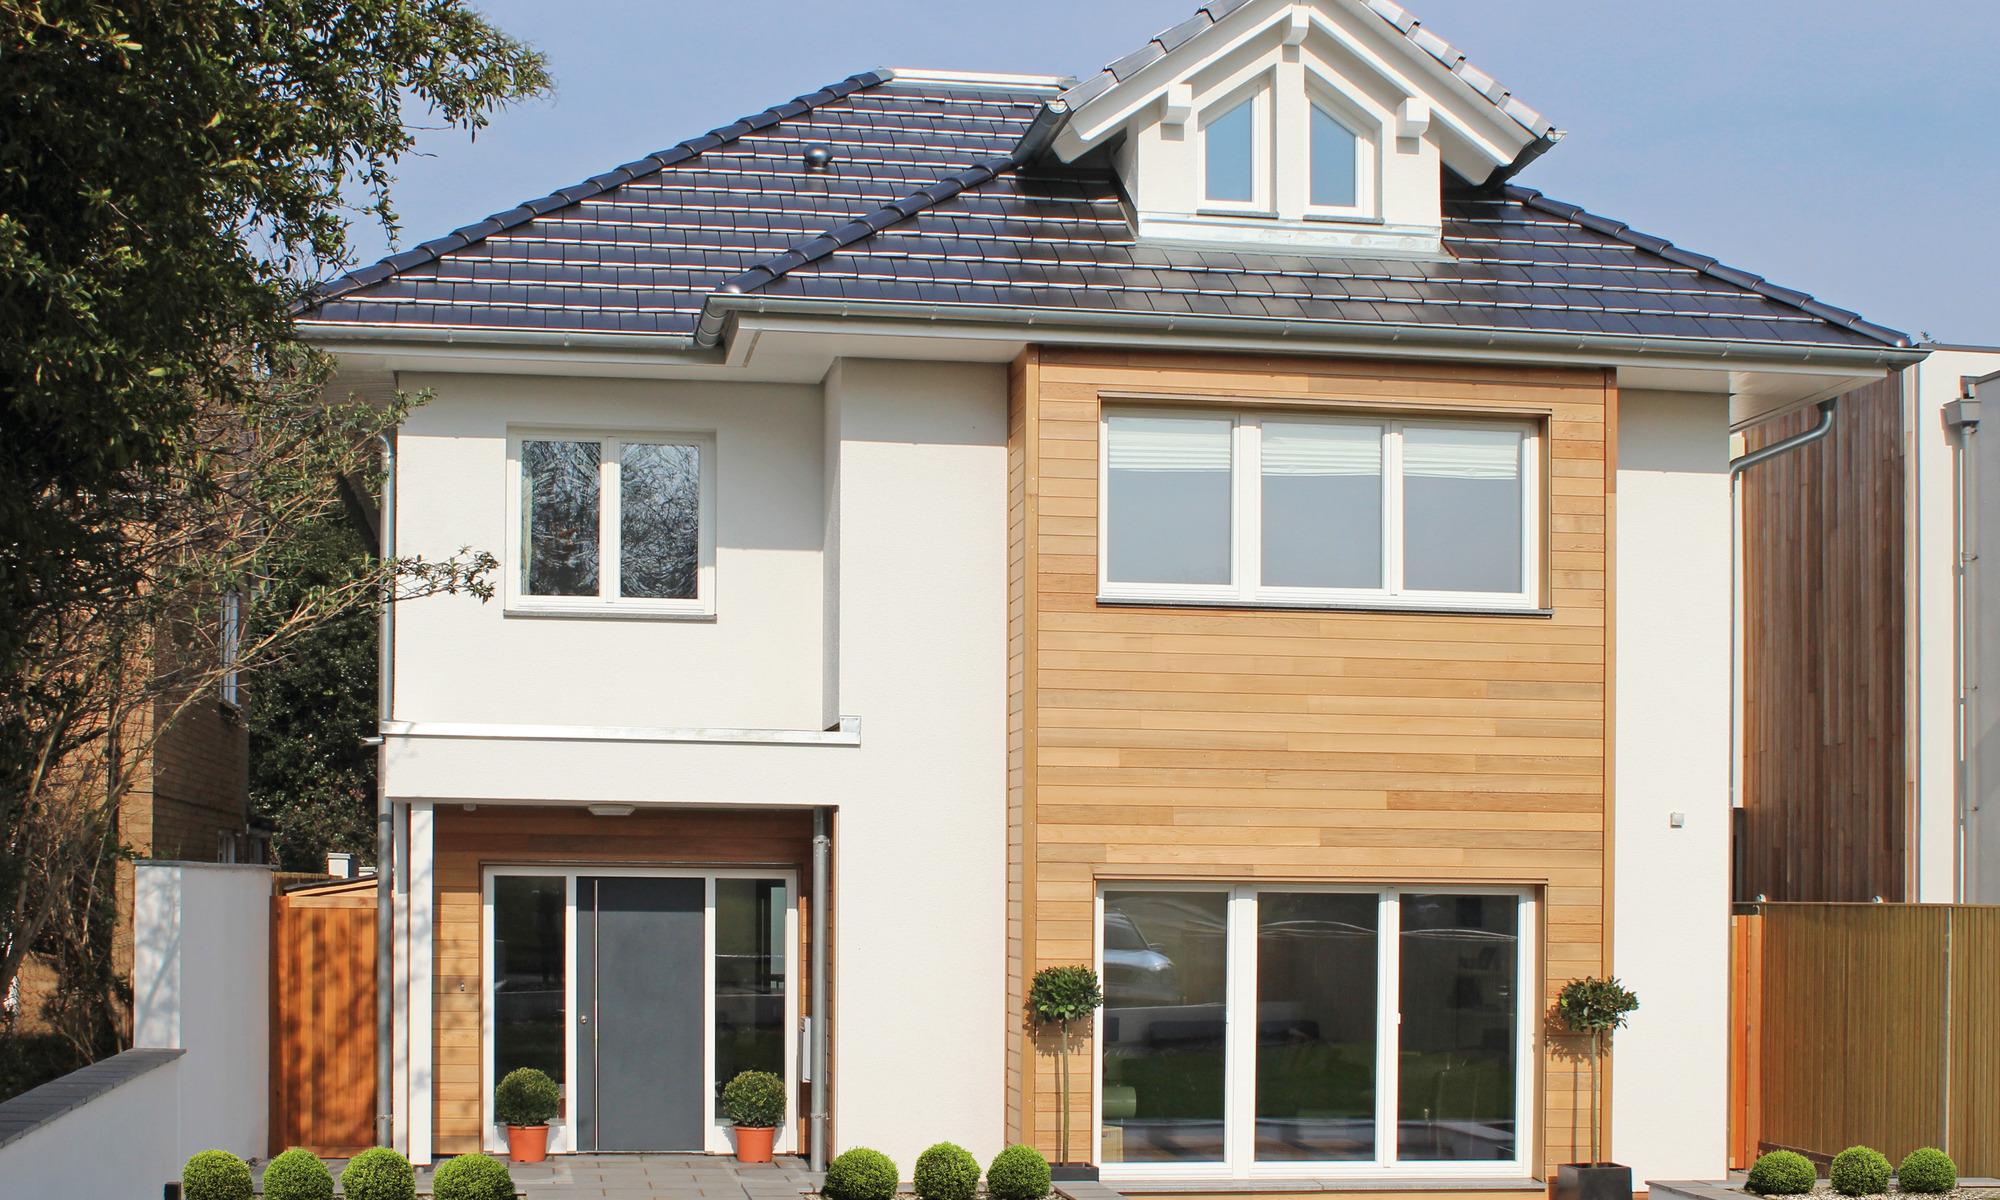 Open plan prefabricated house with sliding door